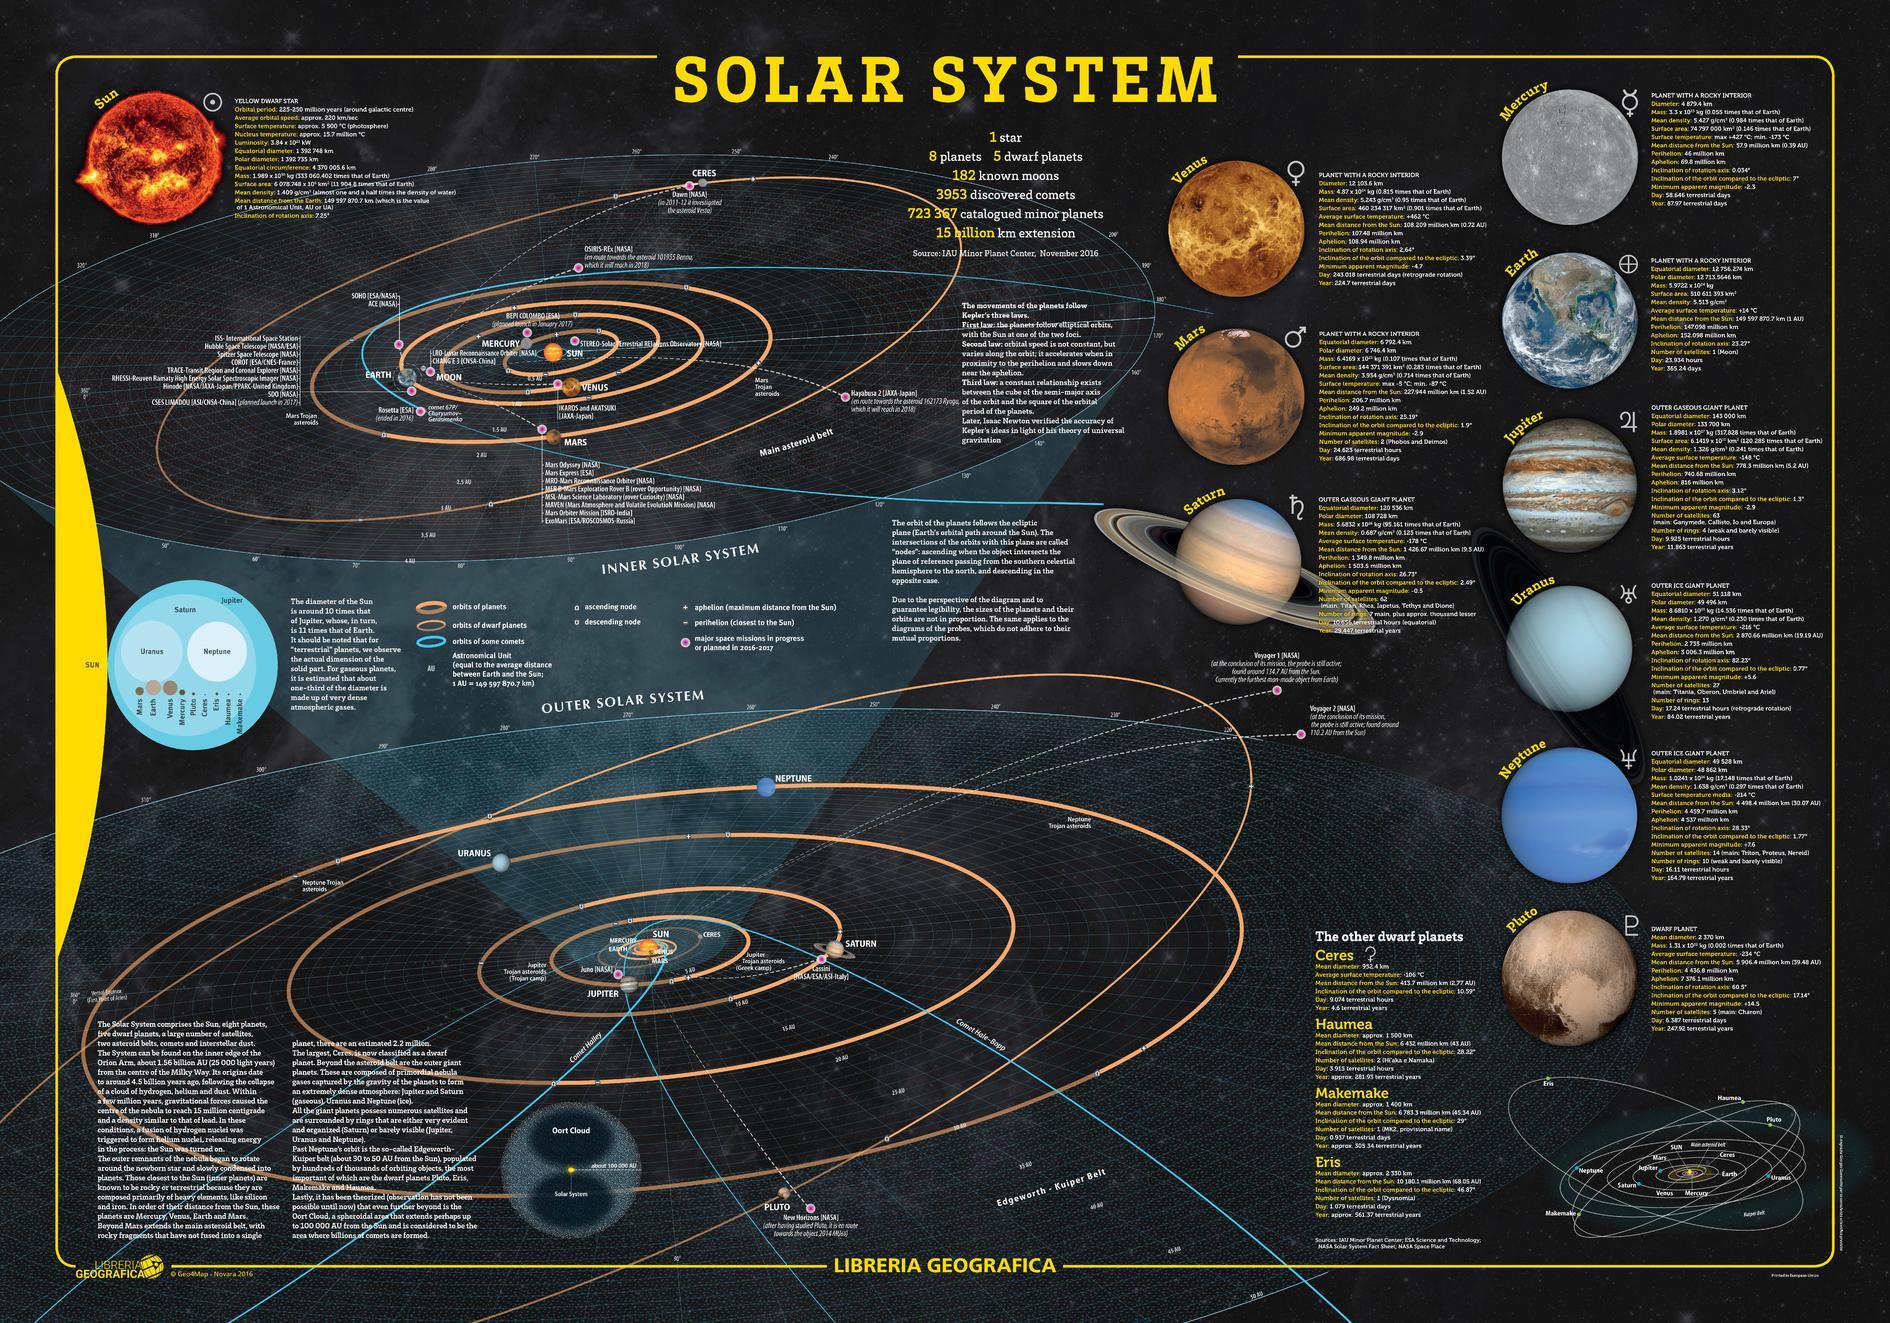 Solar System Trans Neptunian Objects Educational Cool Wall Decor Art Print Poste